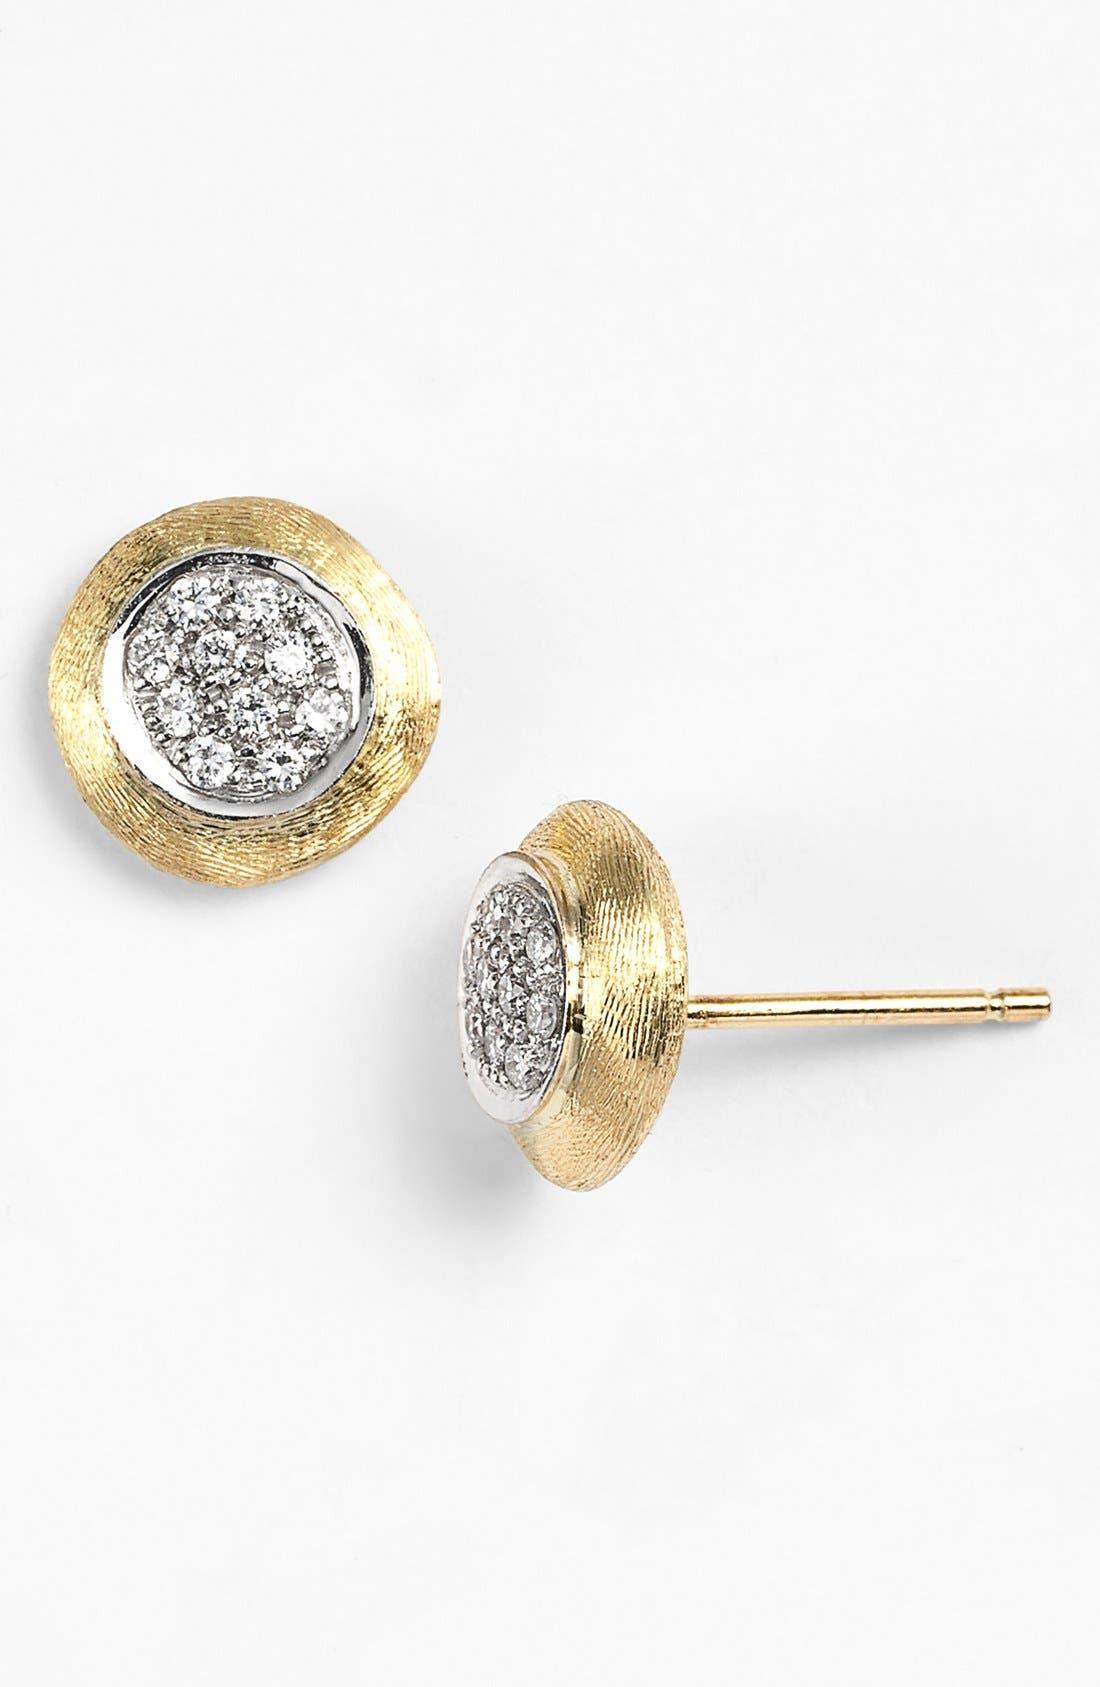 'Delicate' Diamond Stud Earrings,                             Main thumbnail 1, color,                             YELLOW GOLD